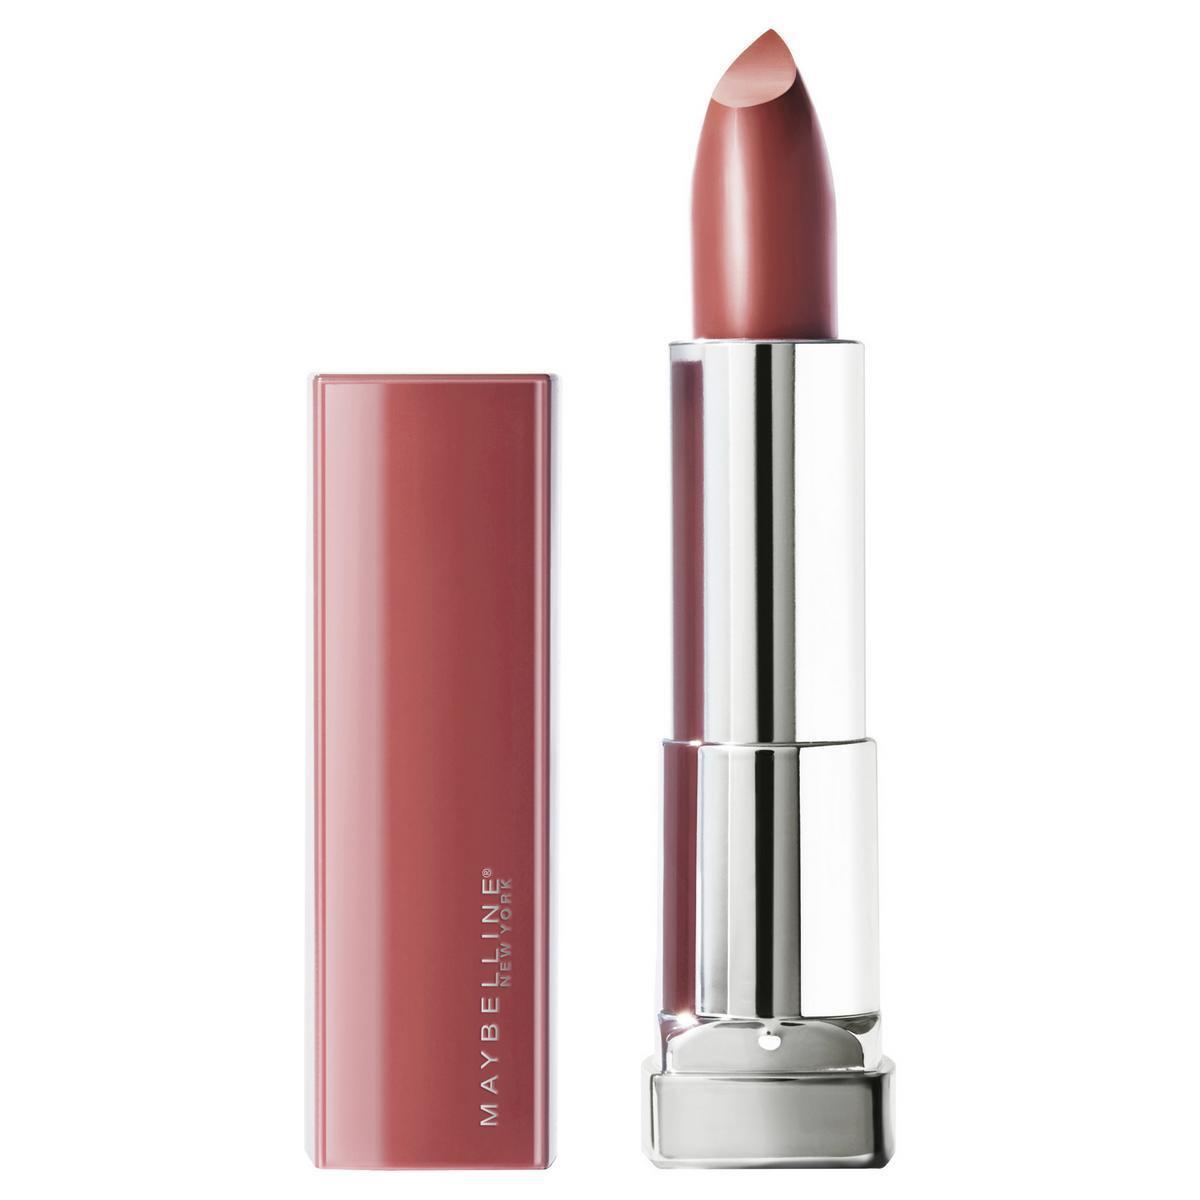 Maybelline New York Помада для губ Color Sensational Made For All, сатиновая, тон №373 mauve for me, #1